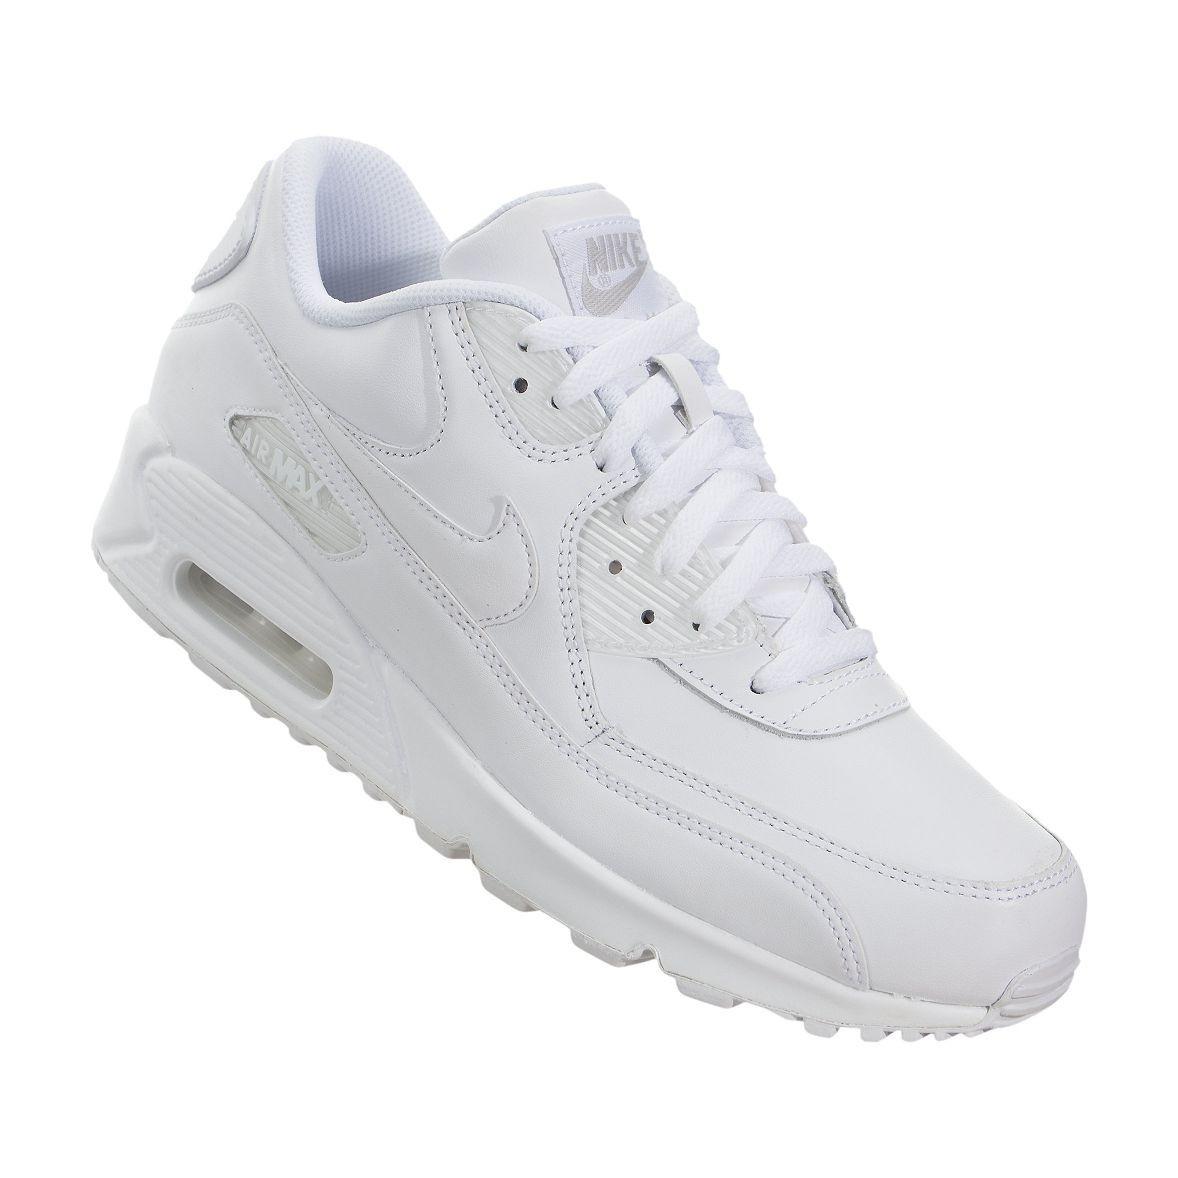 best cheap fba11 fa783 Nike Air Max Invigor Zapatillas Hombre 749680 100 Blancas